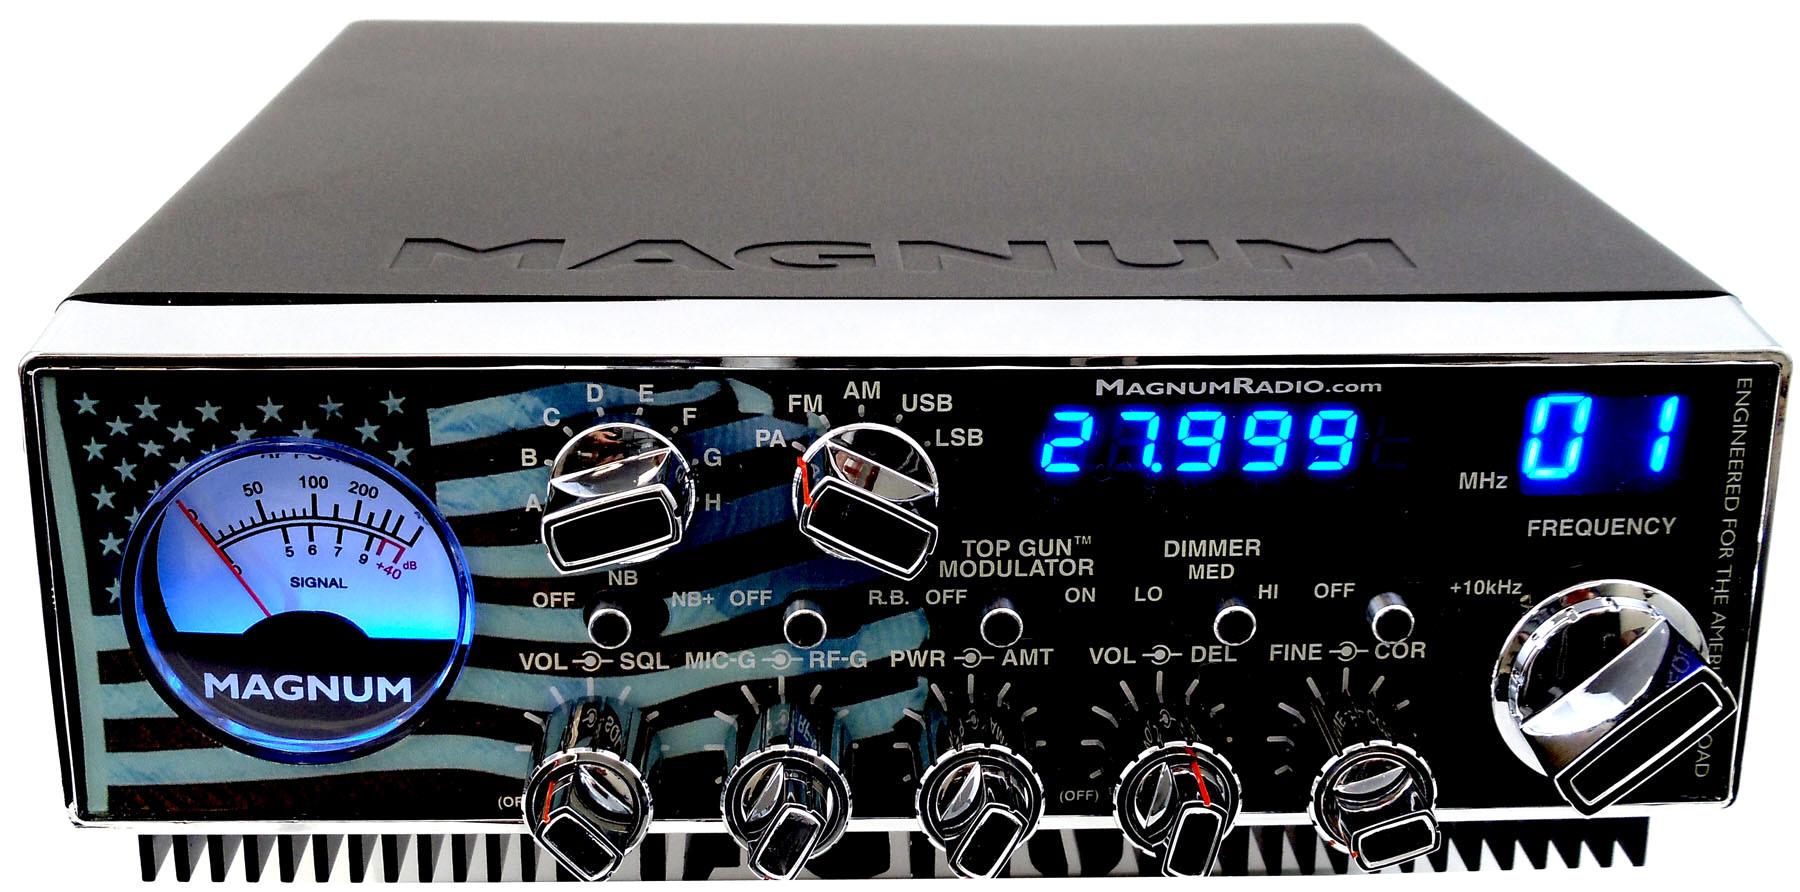 hight resolution of magnum s 9 350 rh bellscb com cb radio microphone wiring diagram outputs cb radio microphone wiring diagram outputs